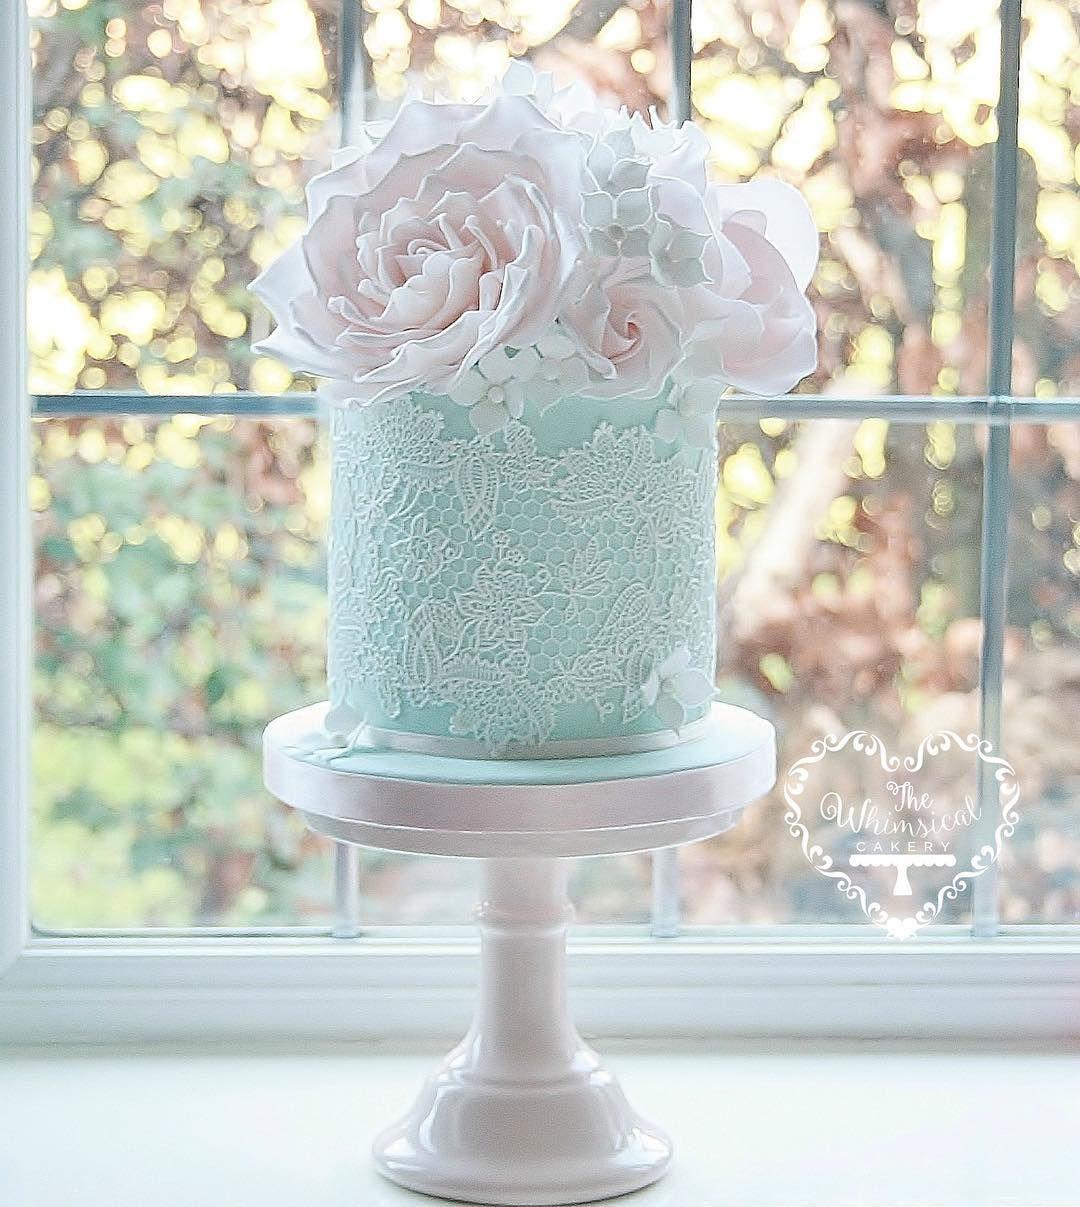 Edible Sugar Lace 02  Birthday Wedding Anniversary cake decoration,shipping from UK